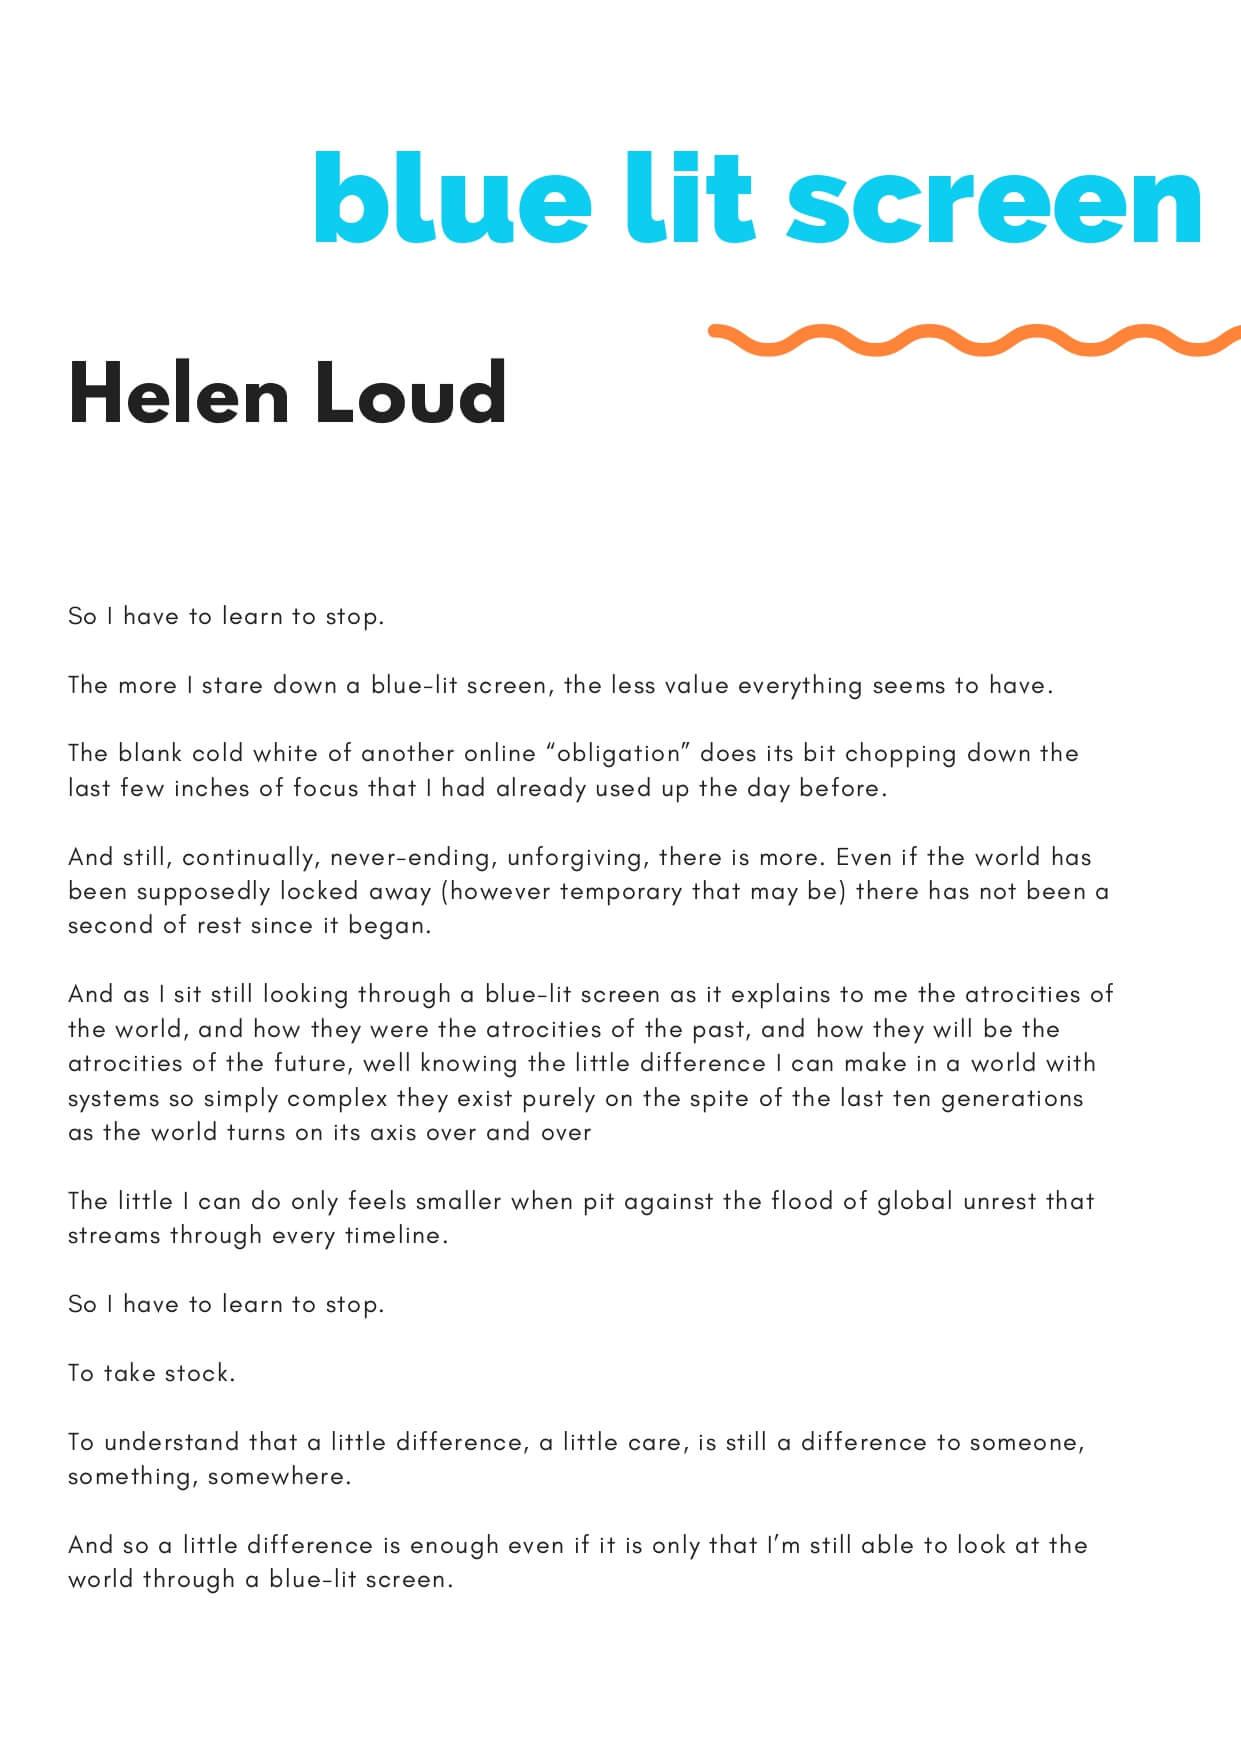 How to Change the World zine - Blue Lit Screen by Helen Loud